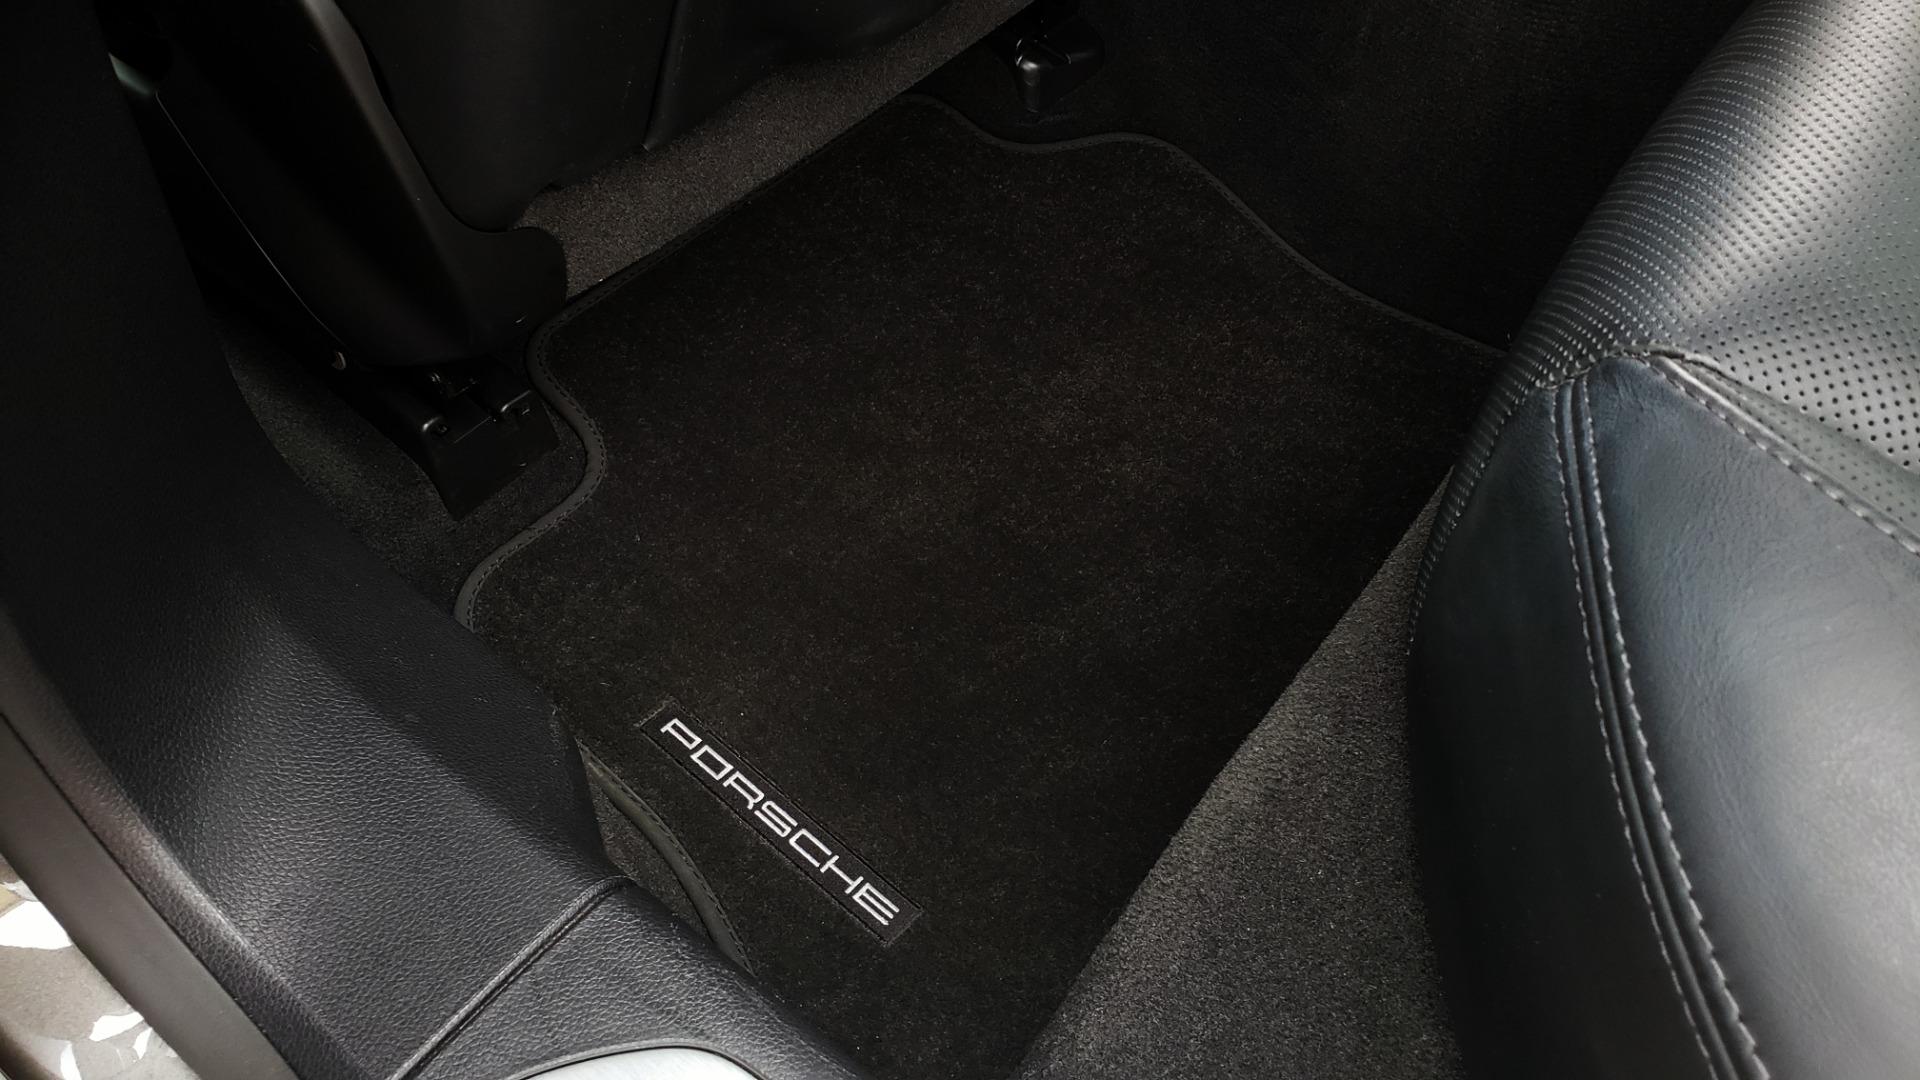 Used 2013 Porsche PANAMERA TURBO 4.8L V8 / AWD / NAV / SUNROOF / LCA / PARK ASST / BURMESTER for sale $45,995 at Formula Imports in Charlotte NC 28227 63